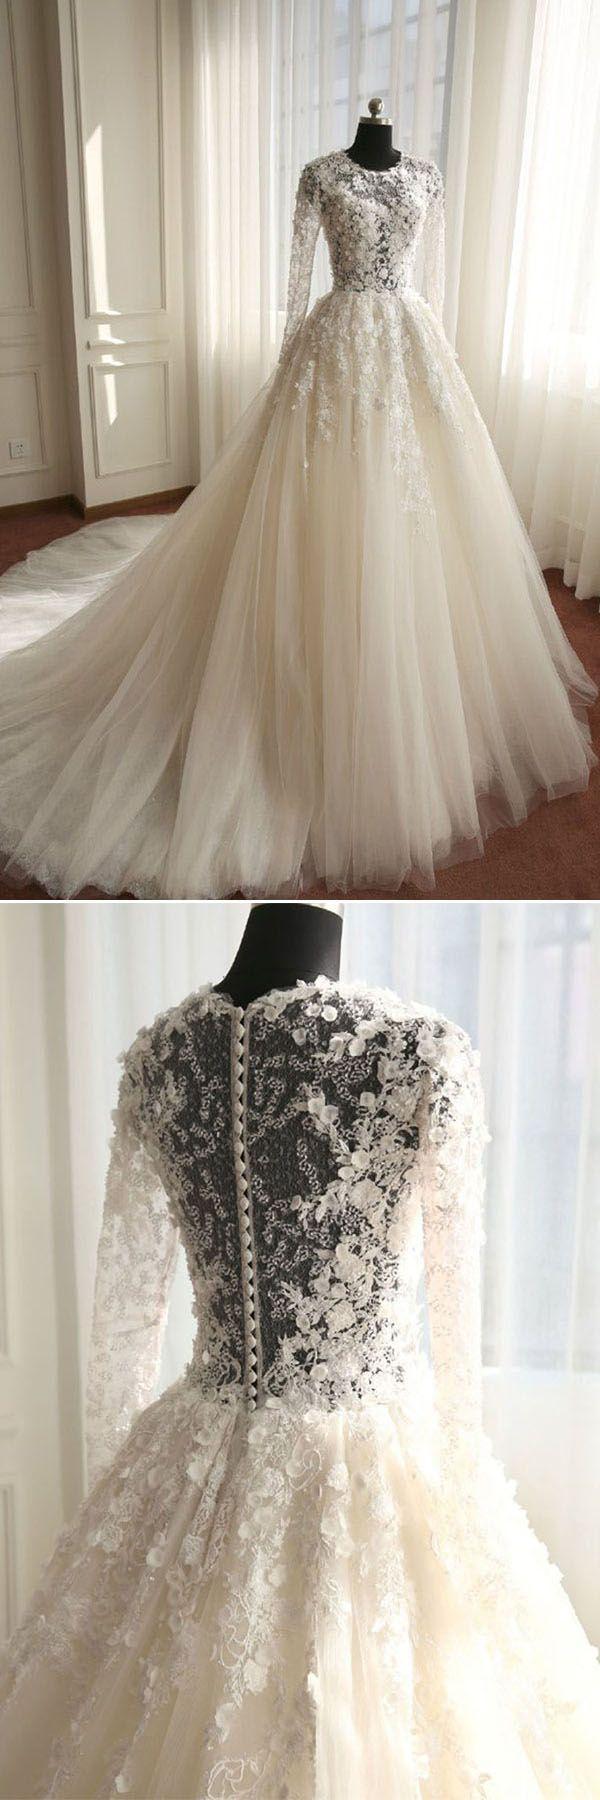 Свадьба - Ivory Tulle Chaple Train Wedding Dress With Long Sleeves(WD0189)